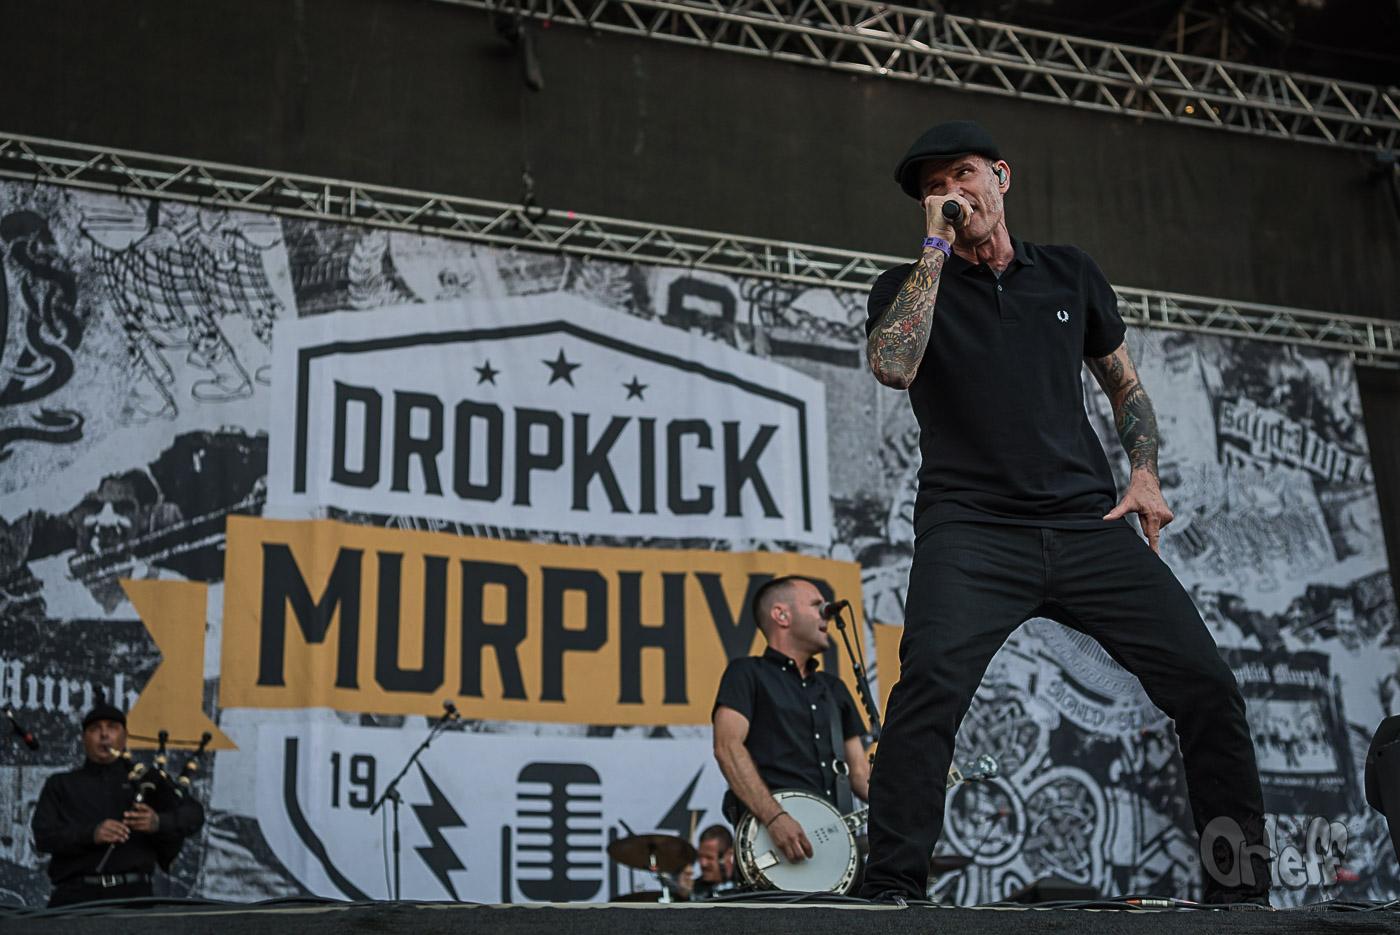 Dropkick Murphys @ Nova Rock 2019